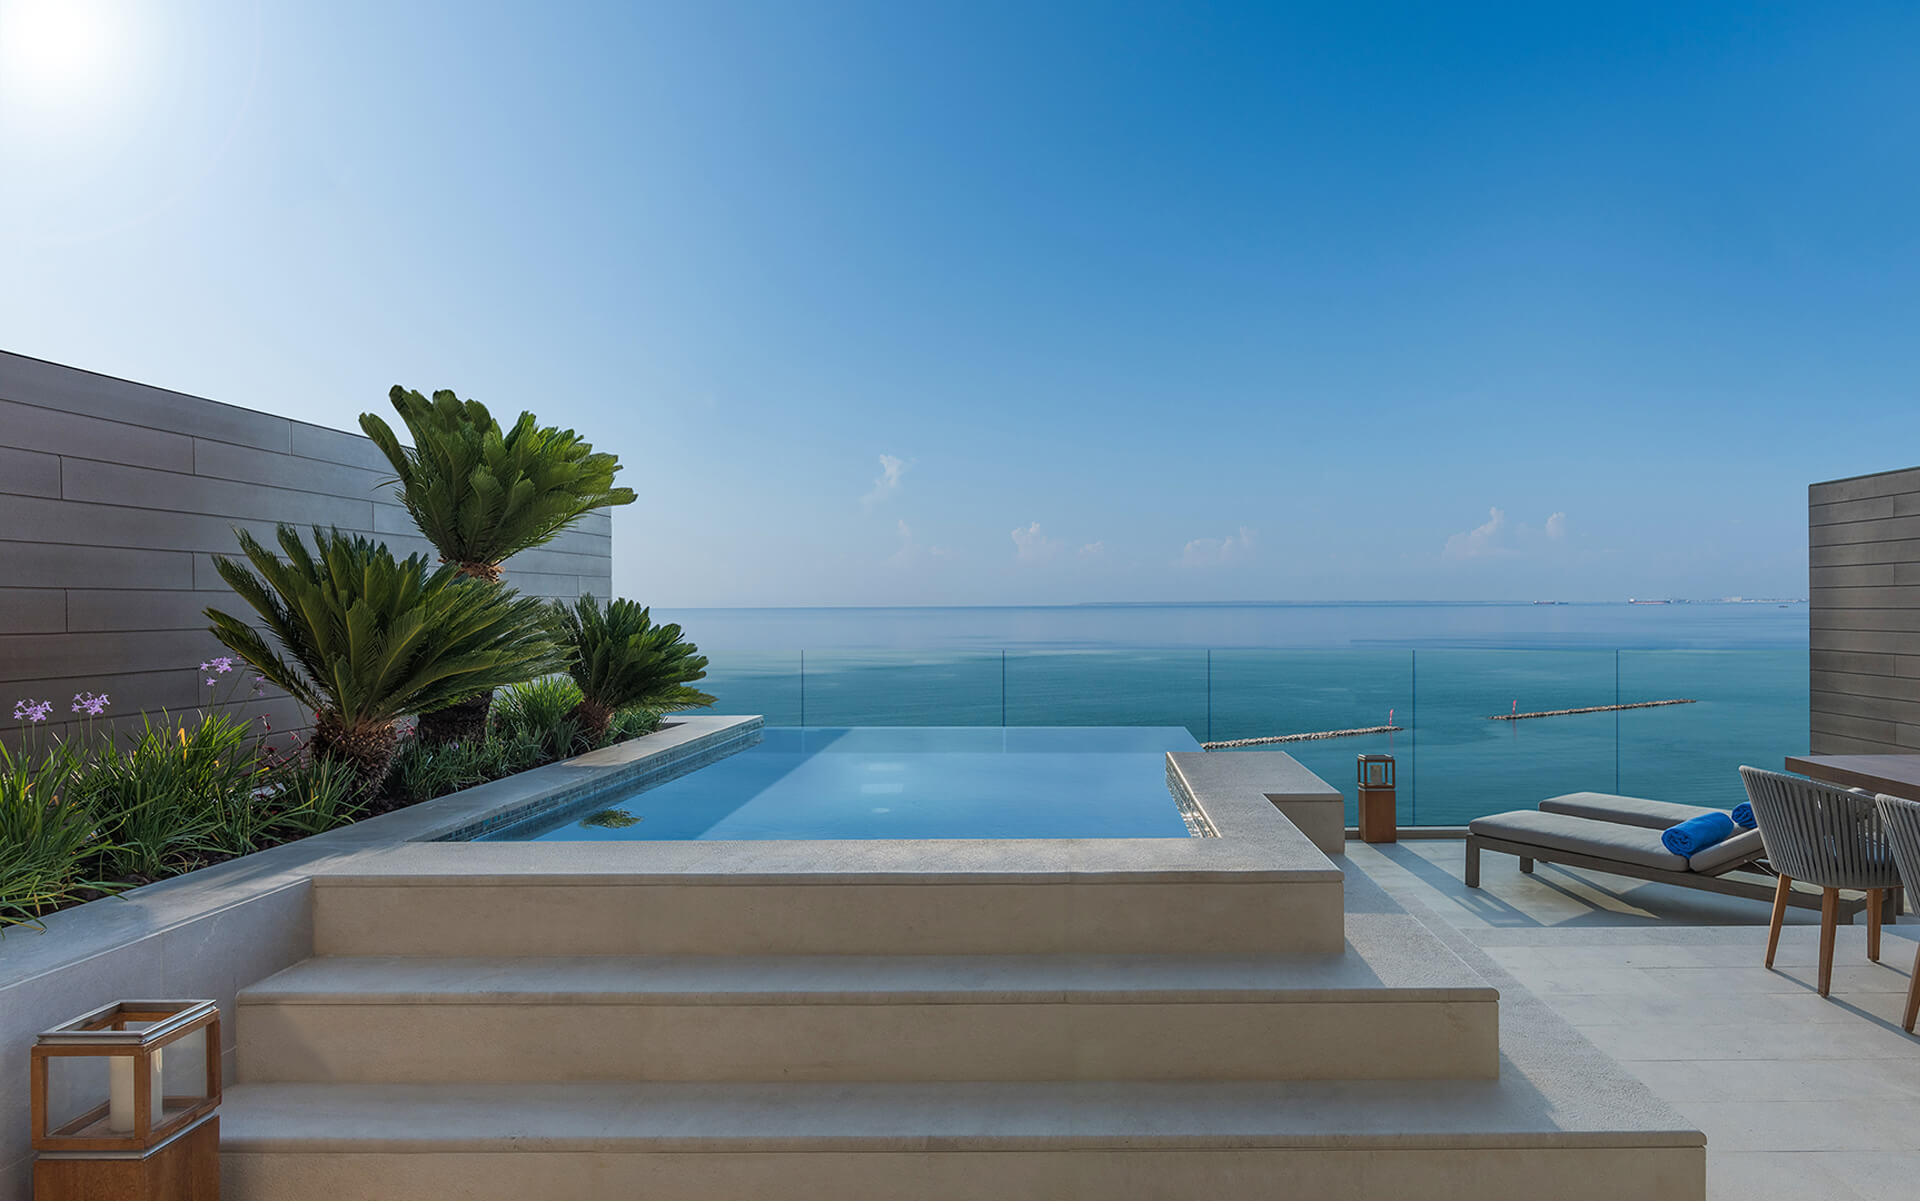 Amara: luxe & bien-être à Chypre - Luxe Wellness Club